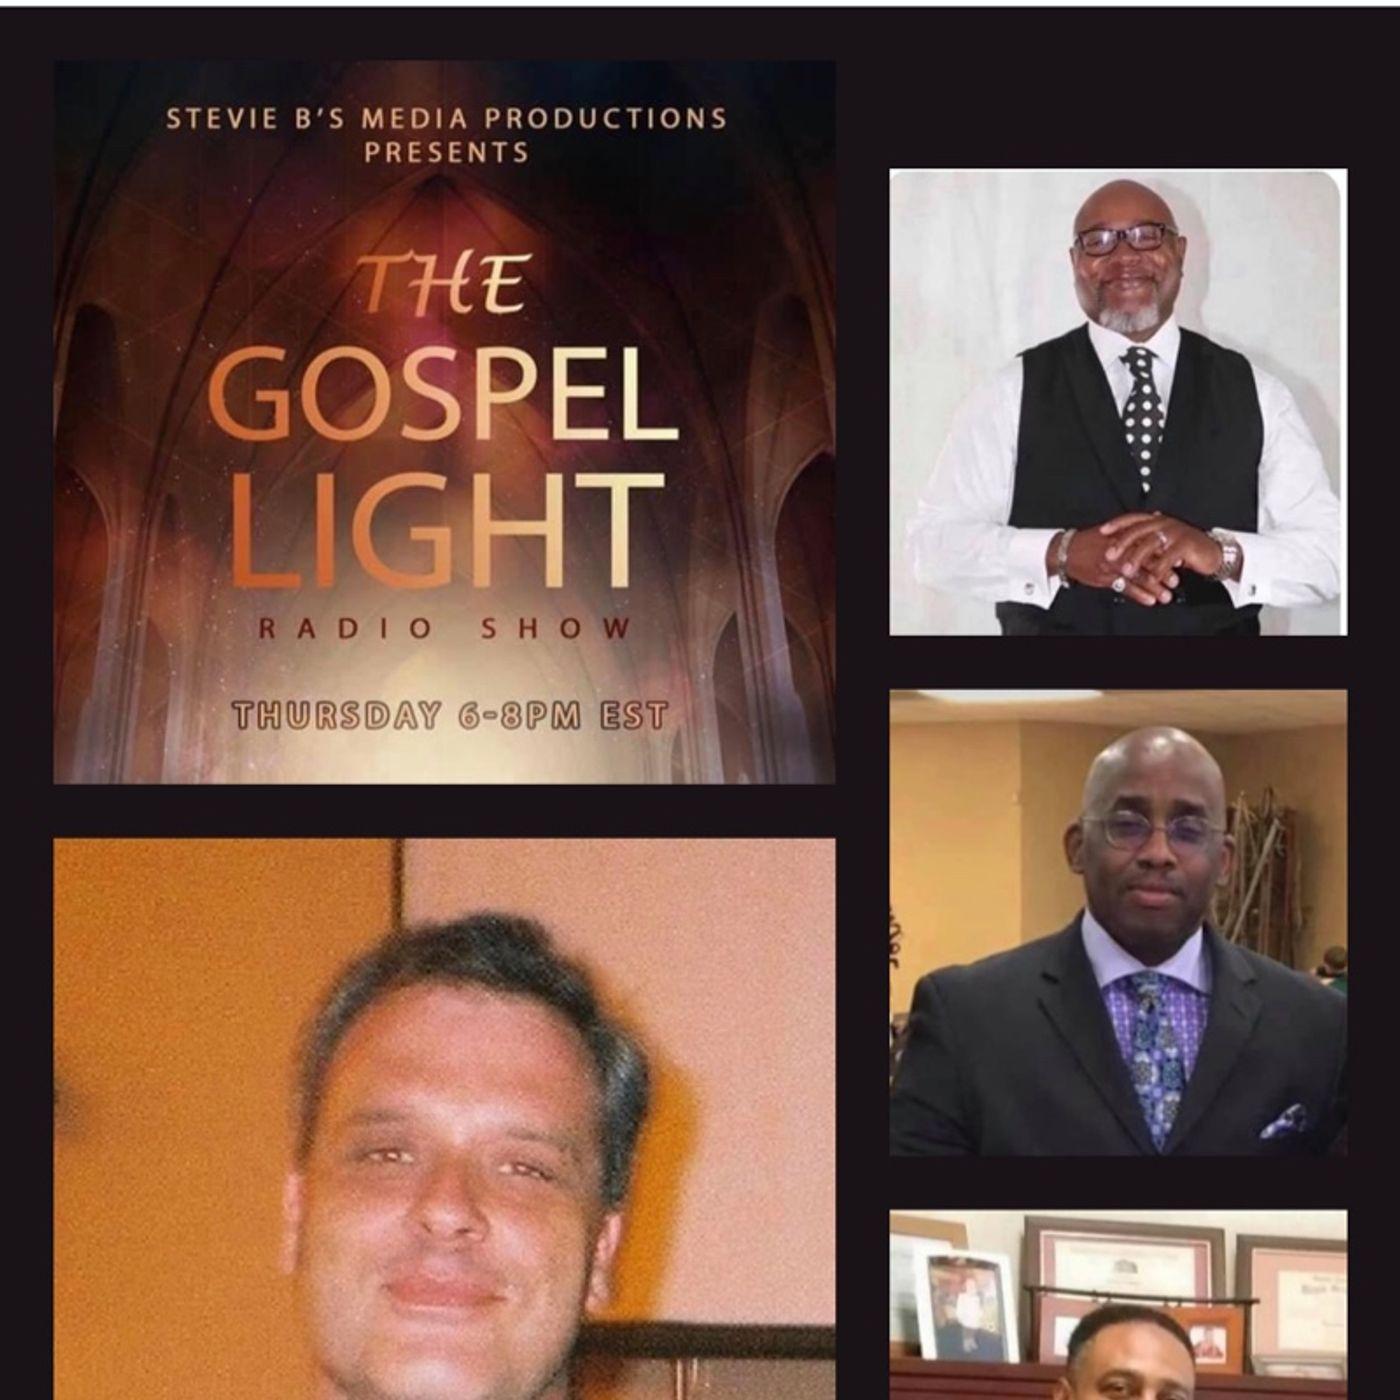 The Gospel Light Radio Show (Episode 235)